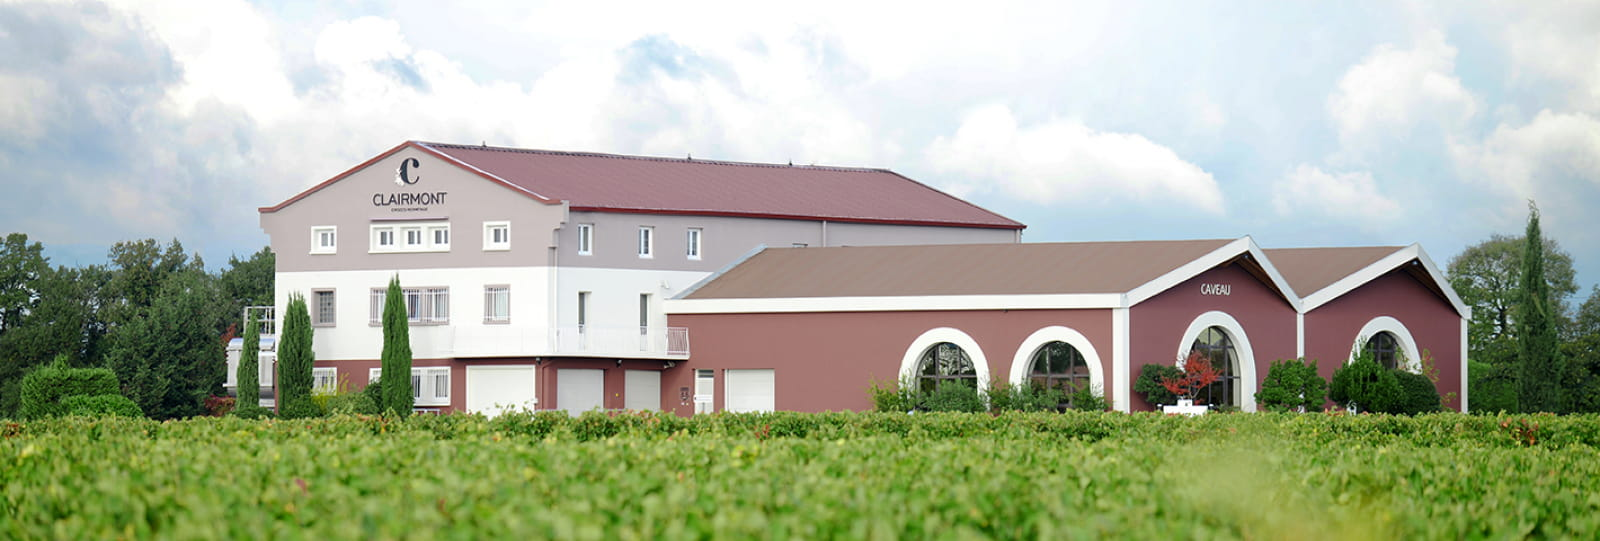 La façade et les vignes